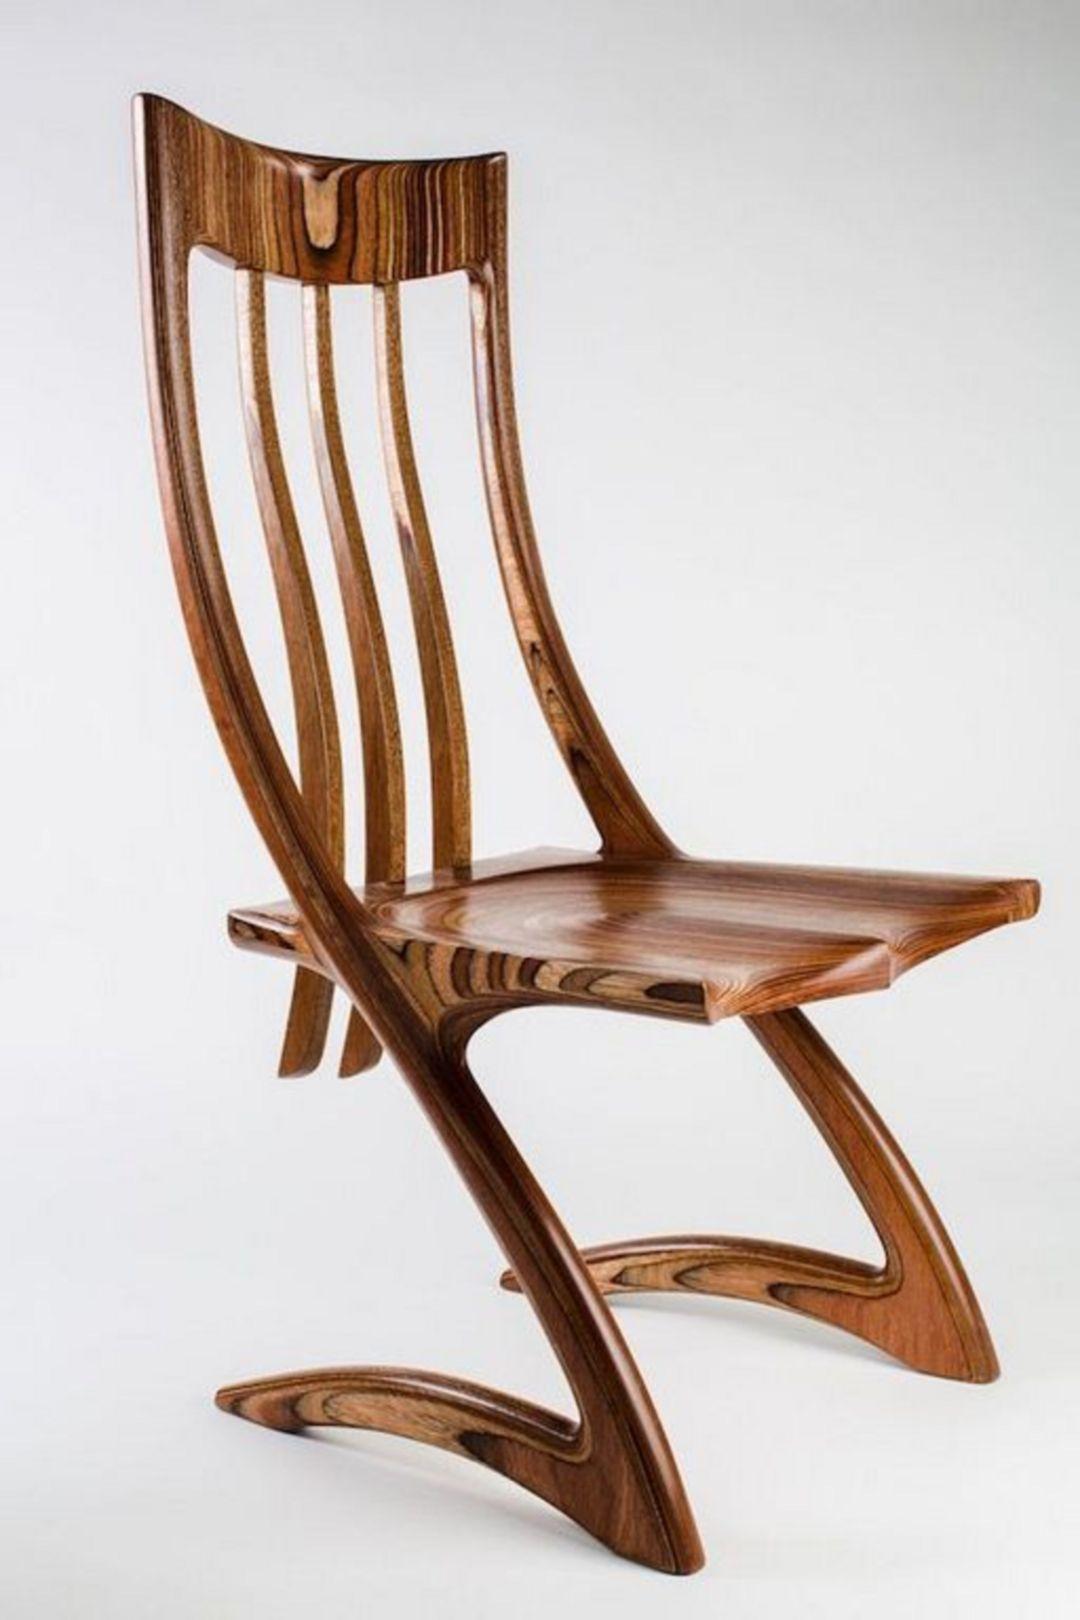 20 unique wooden chair designs for your elegant minimalist